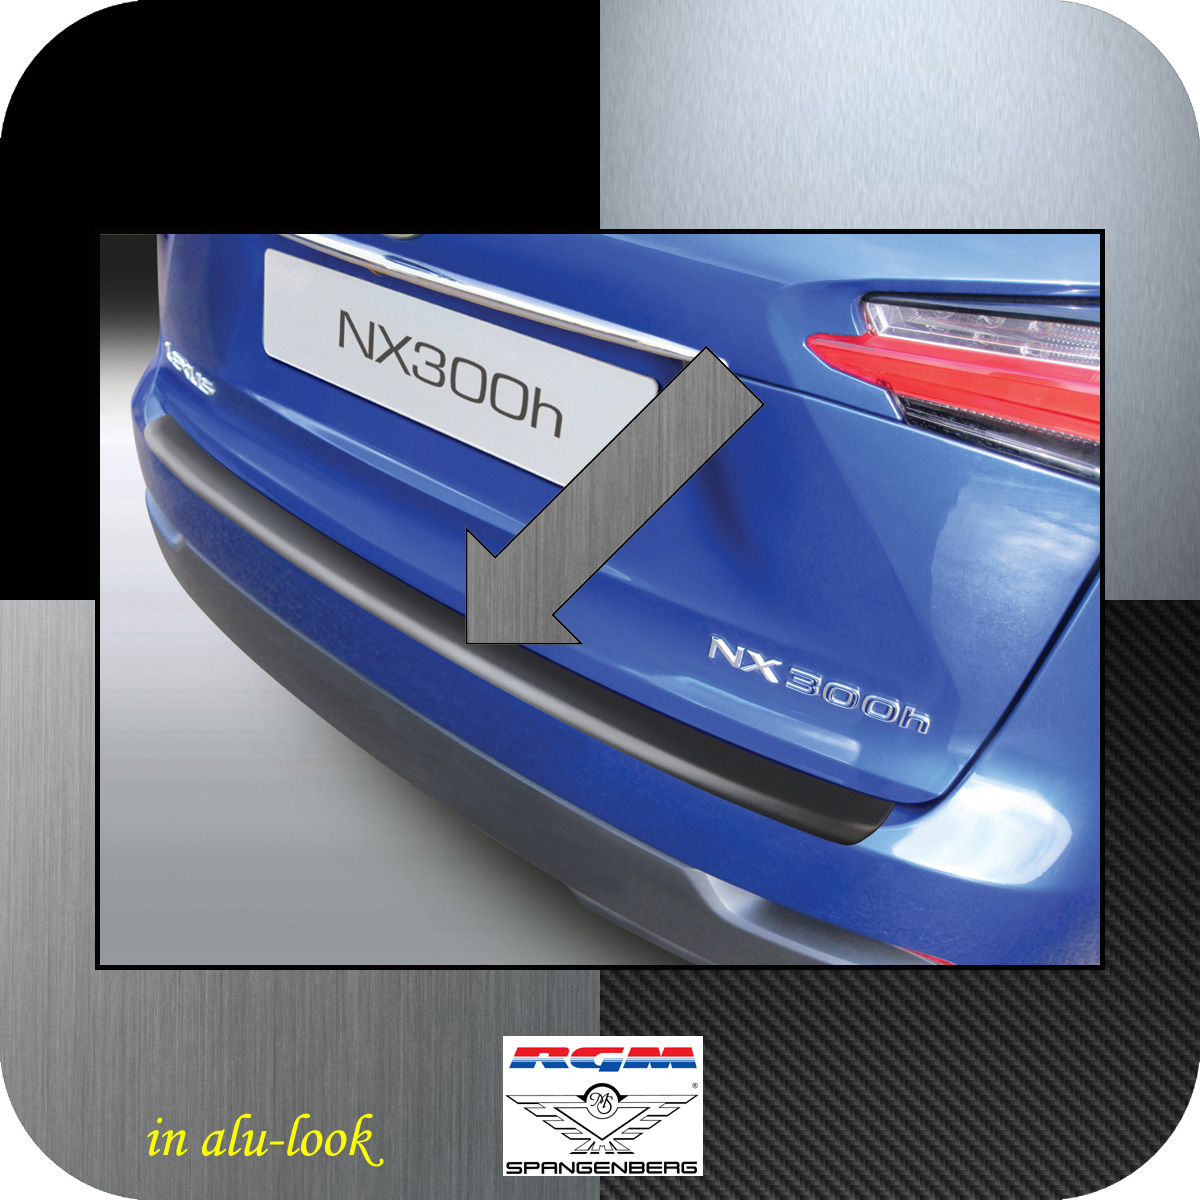 Ladekantenschutz Alu-Look Lexus NX SUV Kombi ab Baujahr 2014- 3504787